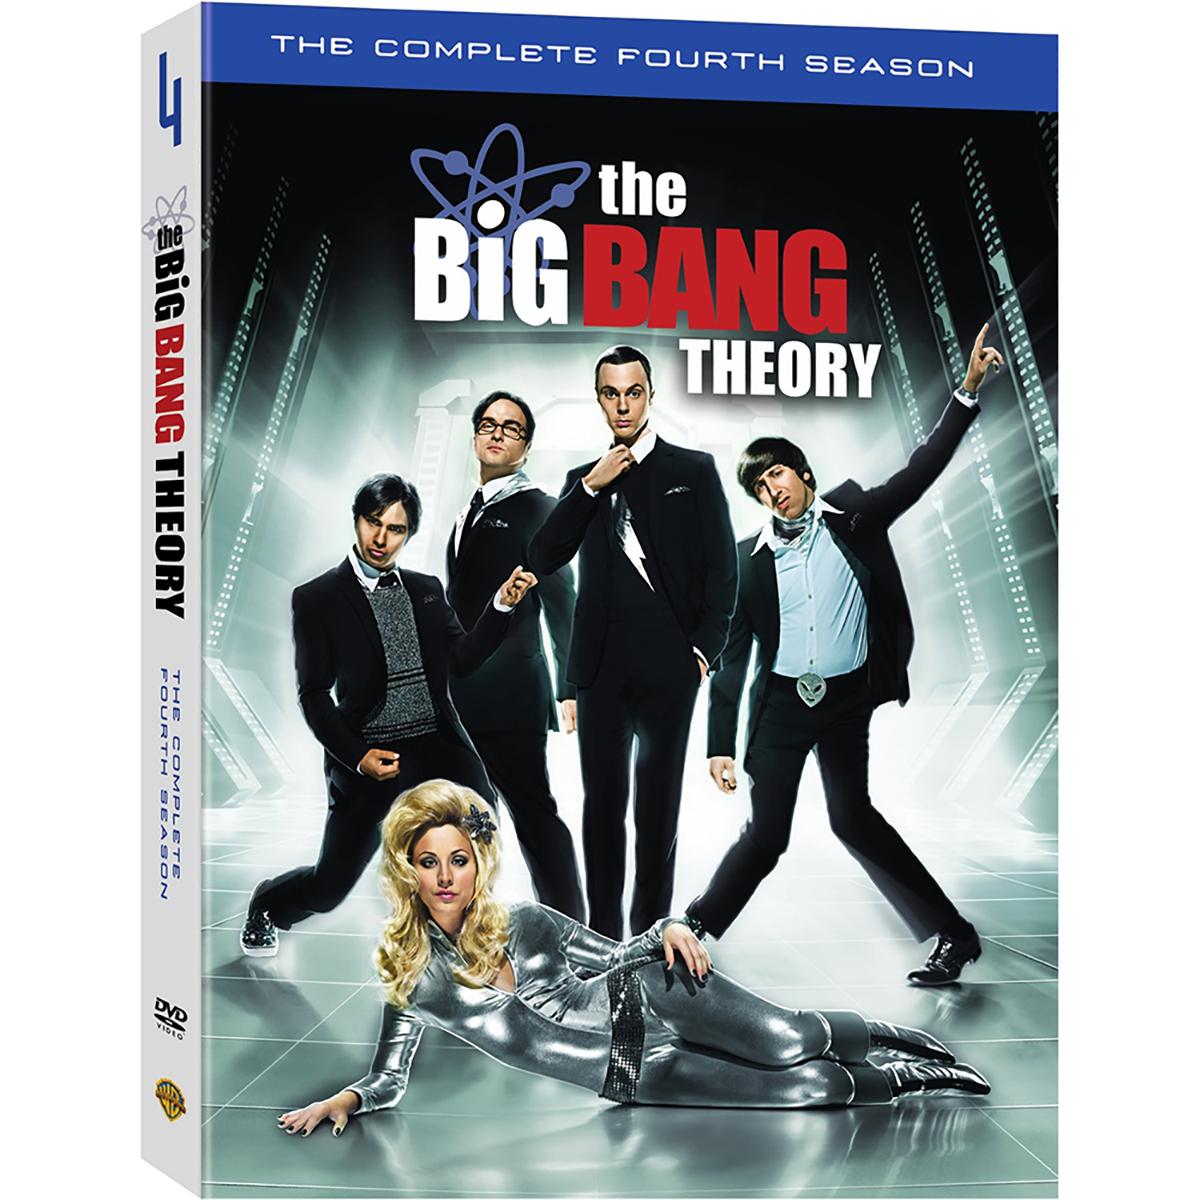 The Big Bang Theory: Season 4 DVD